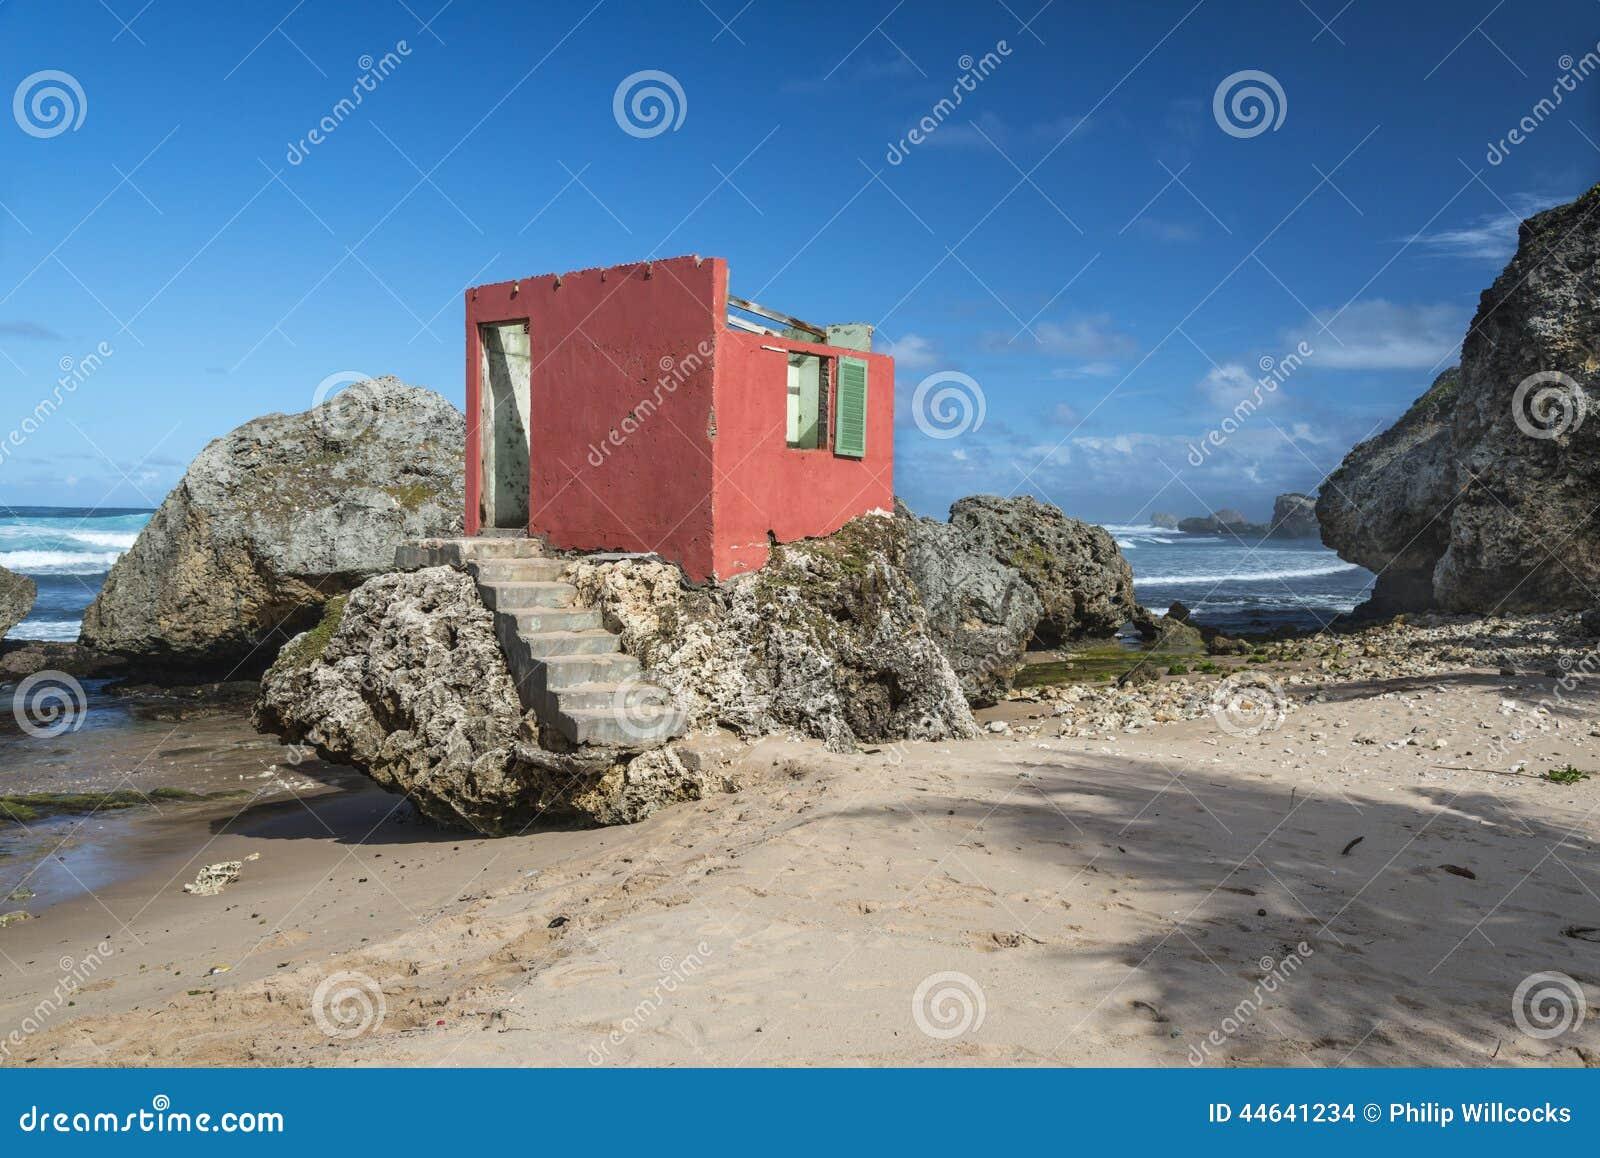 Bathsheba Beach House Barbados